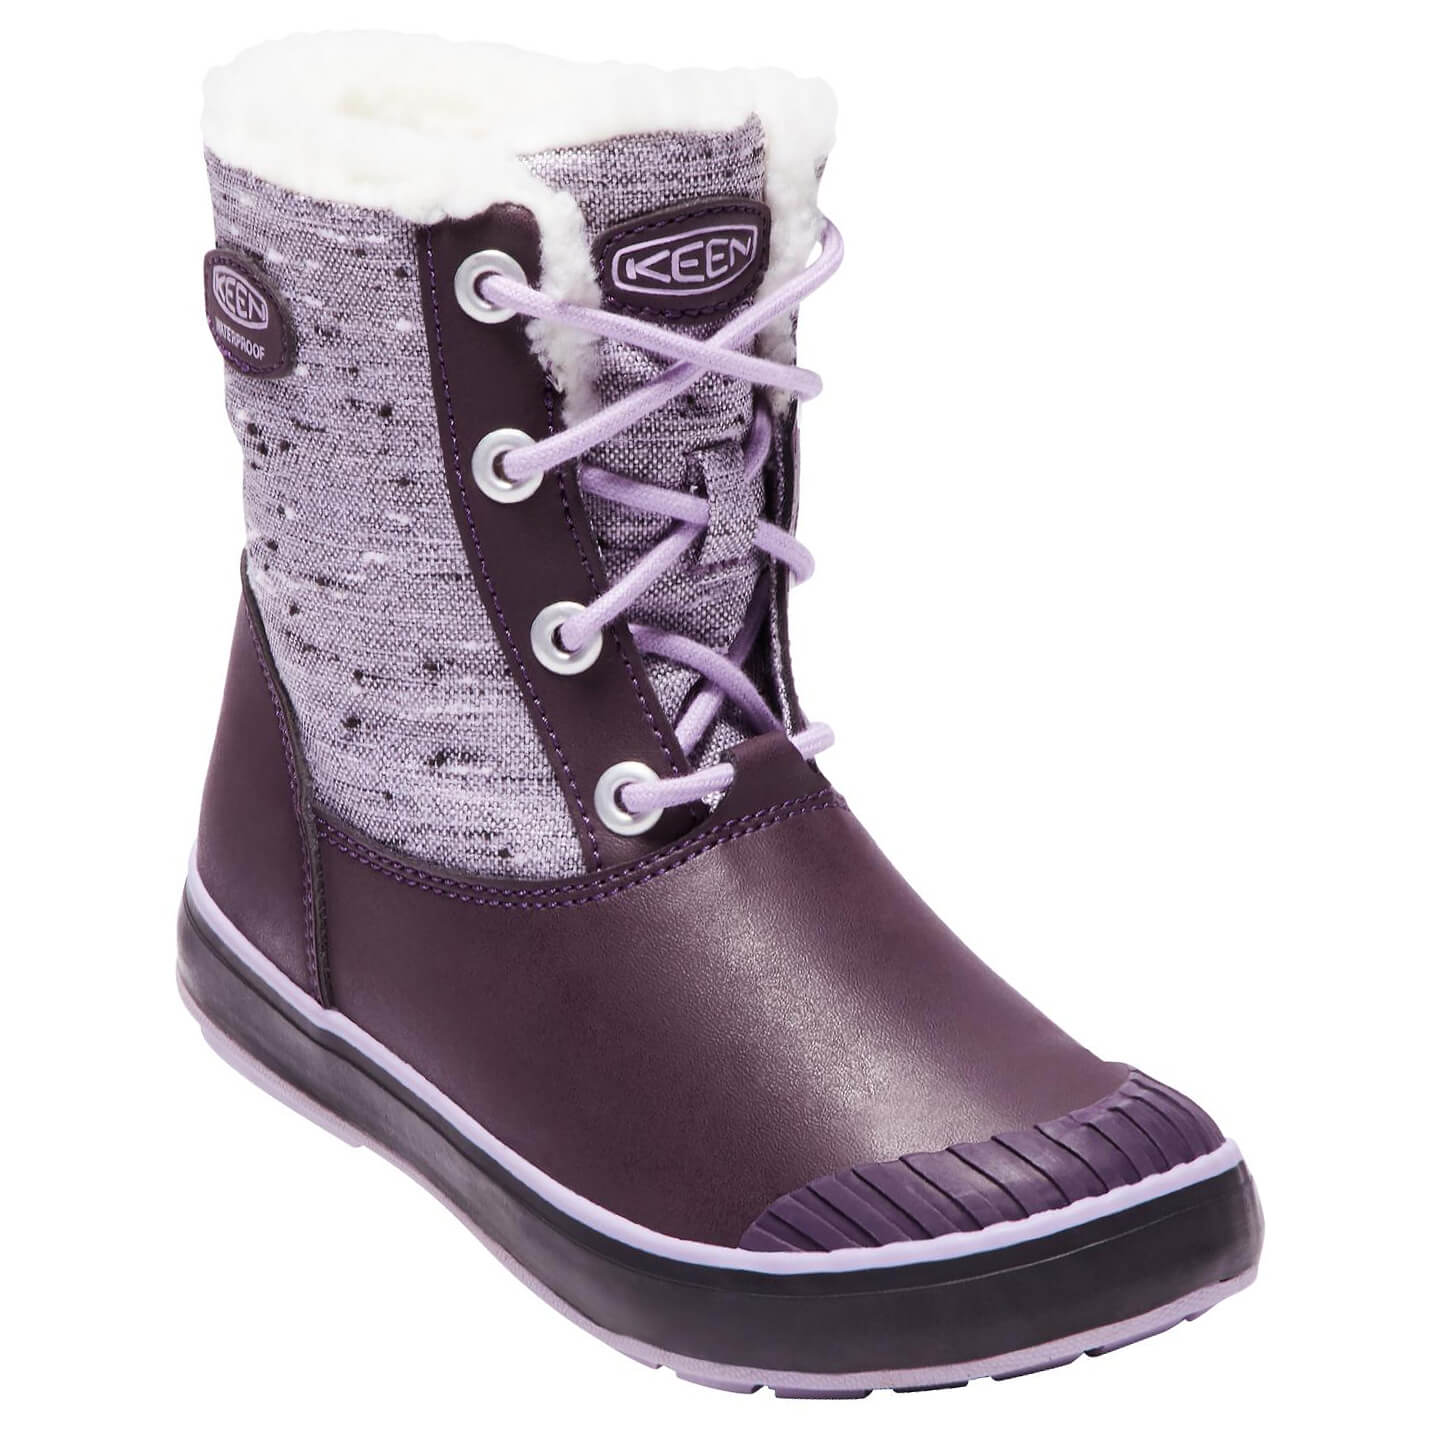 6dae1a1abc3 Keen Youth's Elsa Boot WP - Winter Boots Kids | Buy online |  Alpinetrek.co.uk